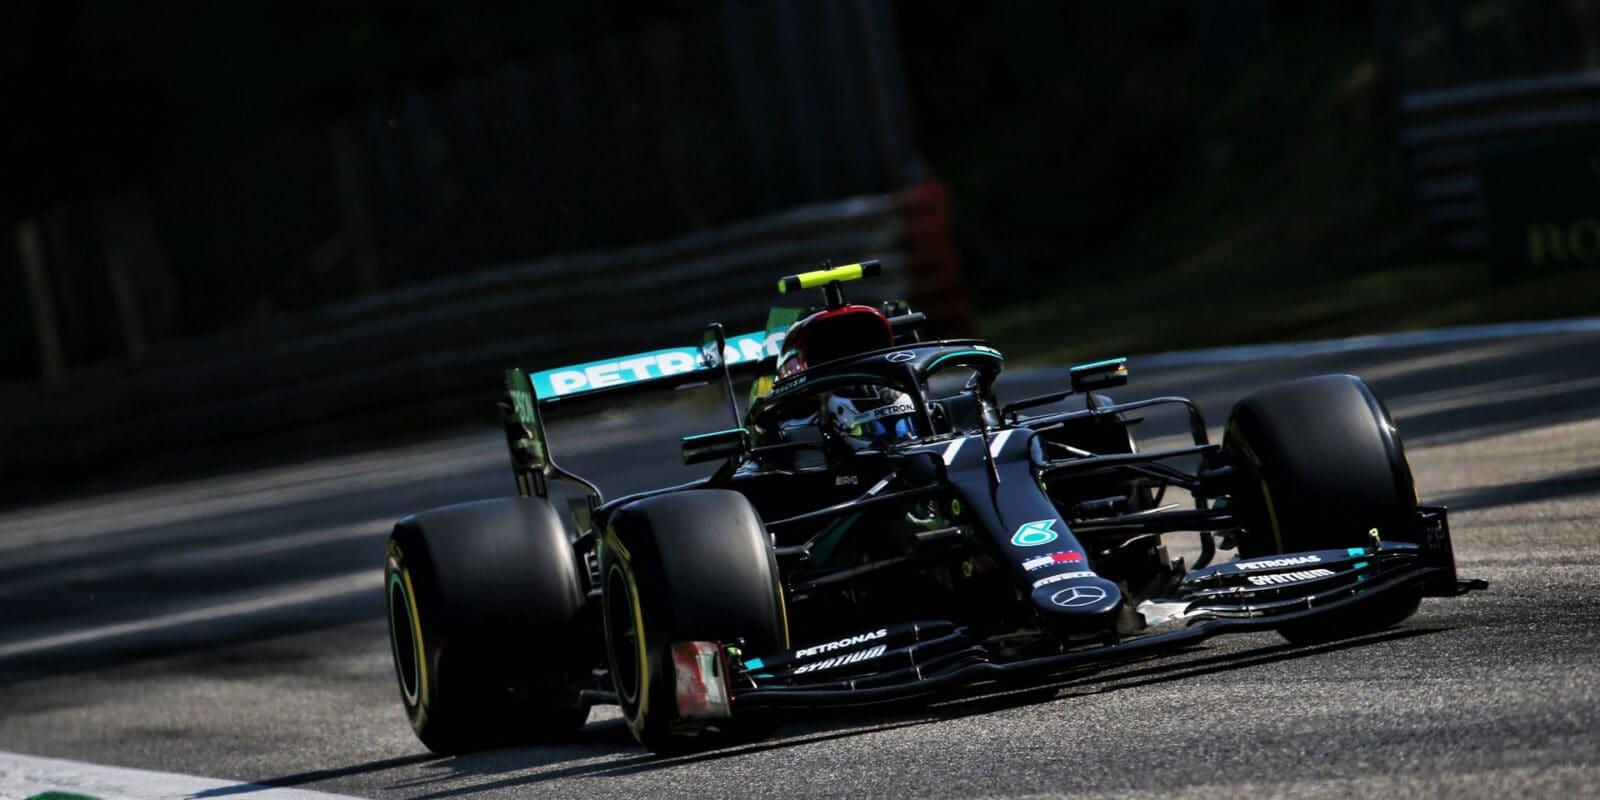 Chrám rychlosti patřil dopoledne Mercedesu